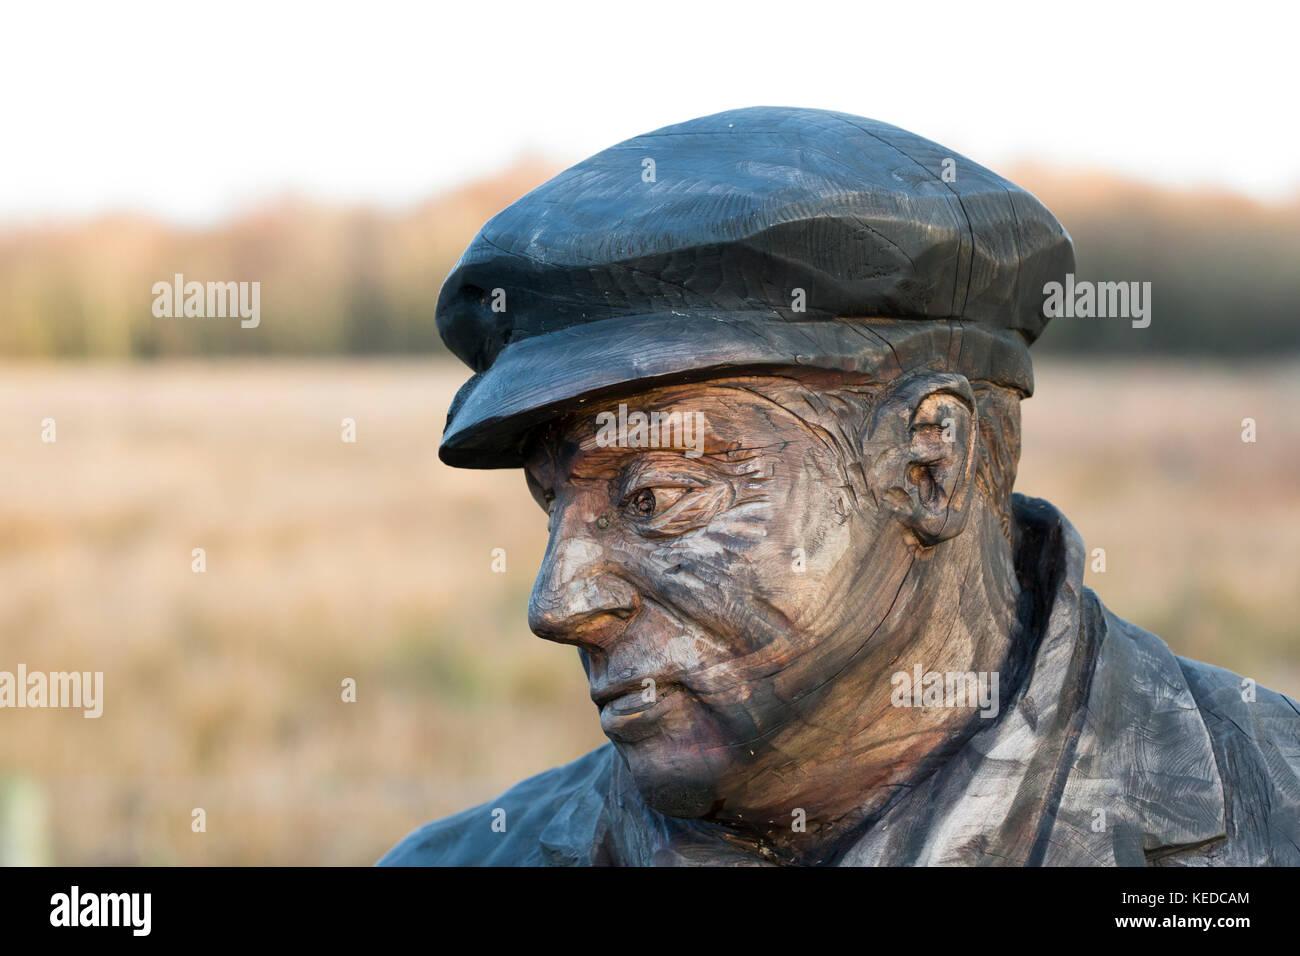 lifesize wooden sculpture of lifelike miner - Stock Image